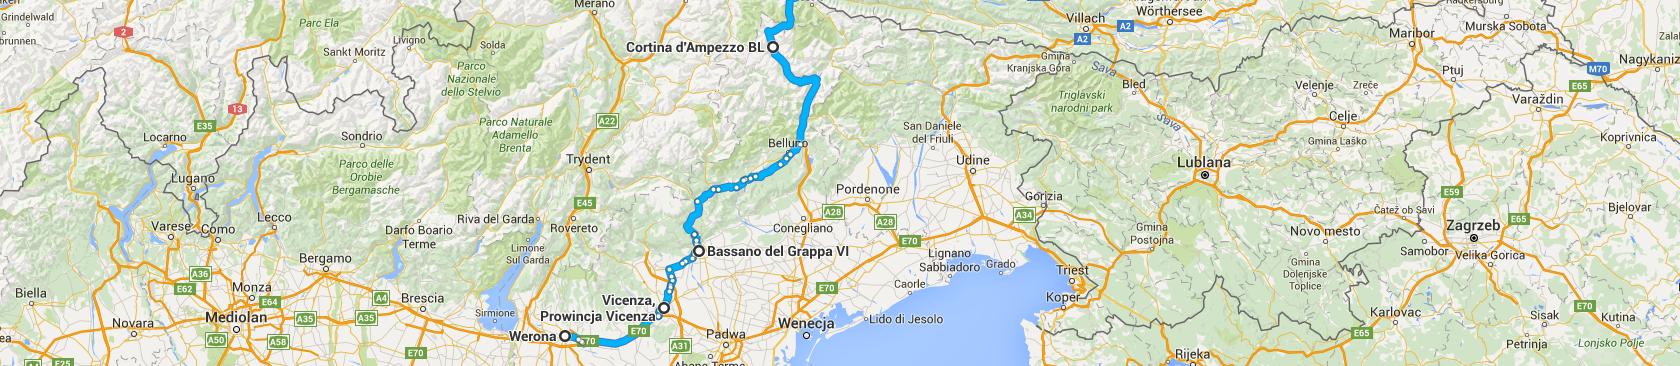 Trasa z Verony do Wiednia